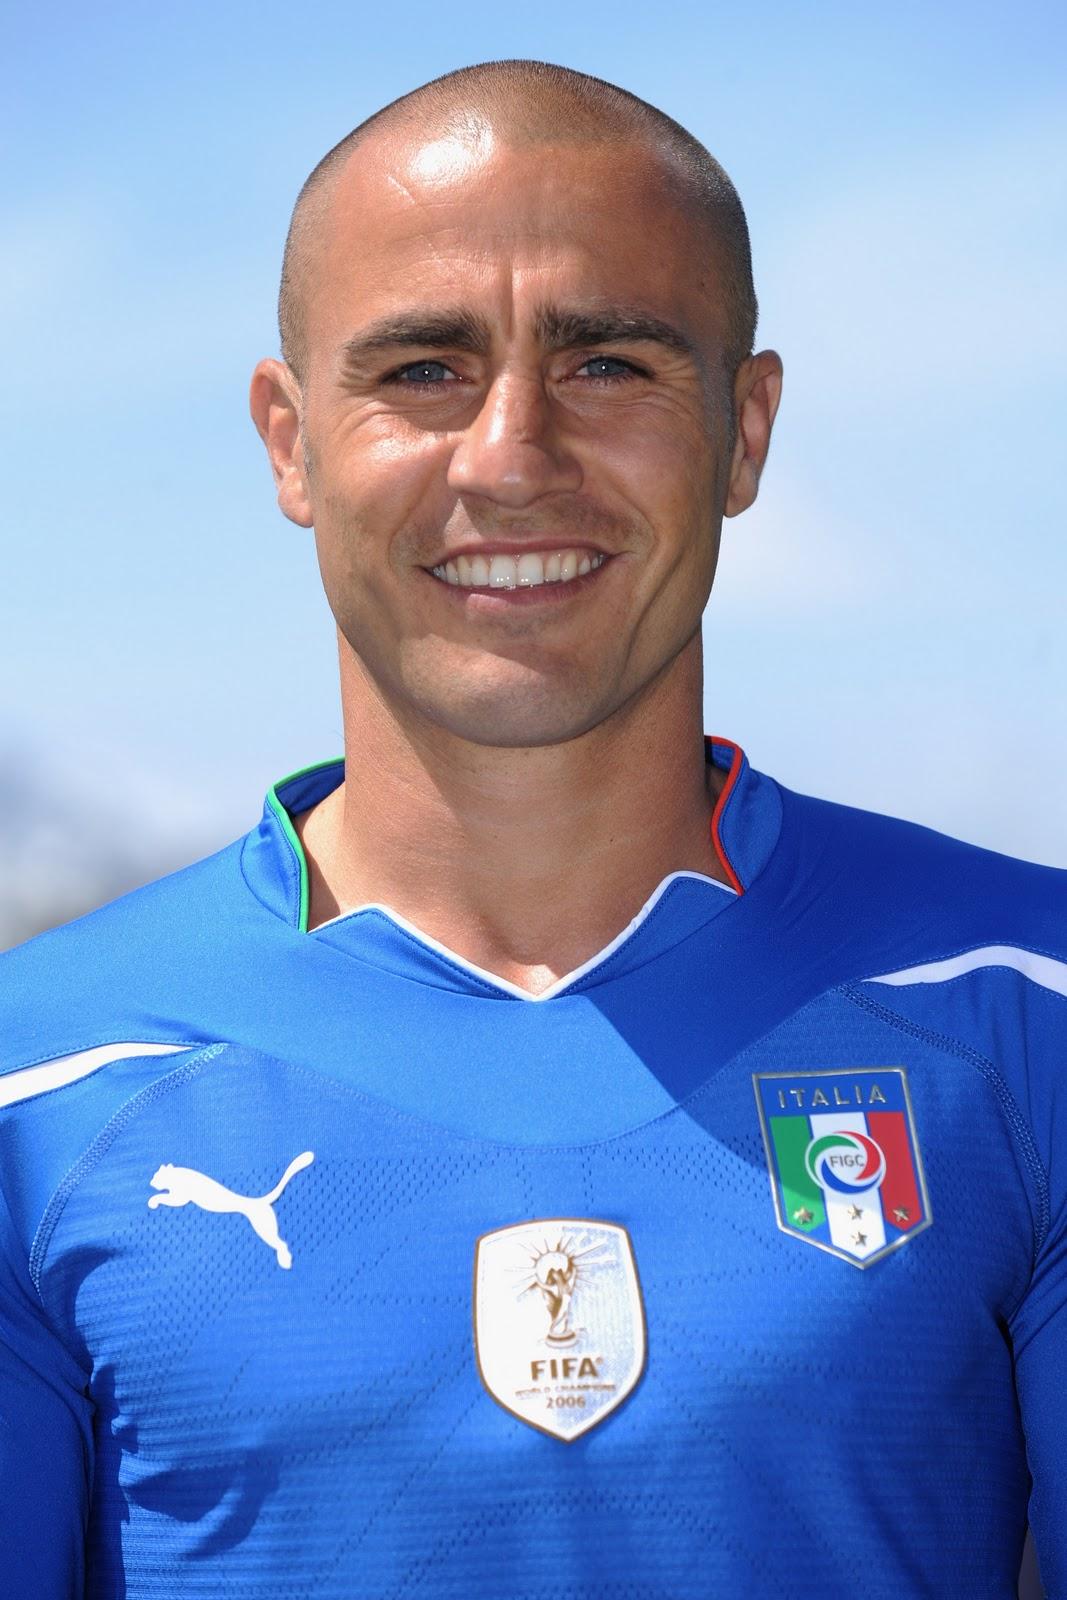 http://2.bp.blogspot.com/-SGLl3lw16gk/TZPNXGvTxcI/AAAAAAAAFtE/E3OcWmUcRdY/s1600/fabio-cannavaro-foto-oficial-da-selecao-italiana-1.jpg